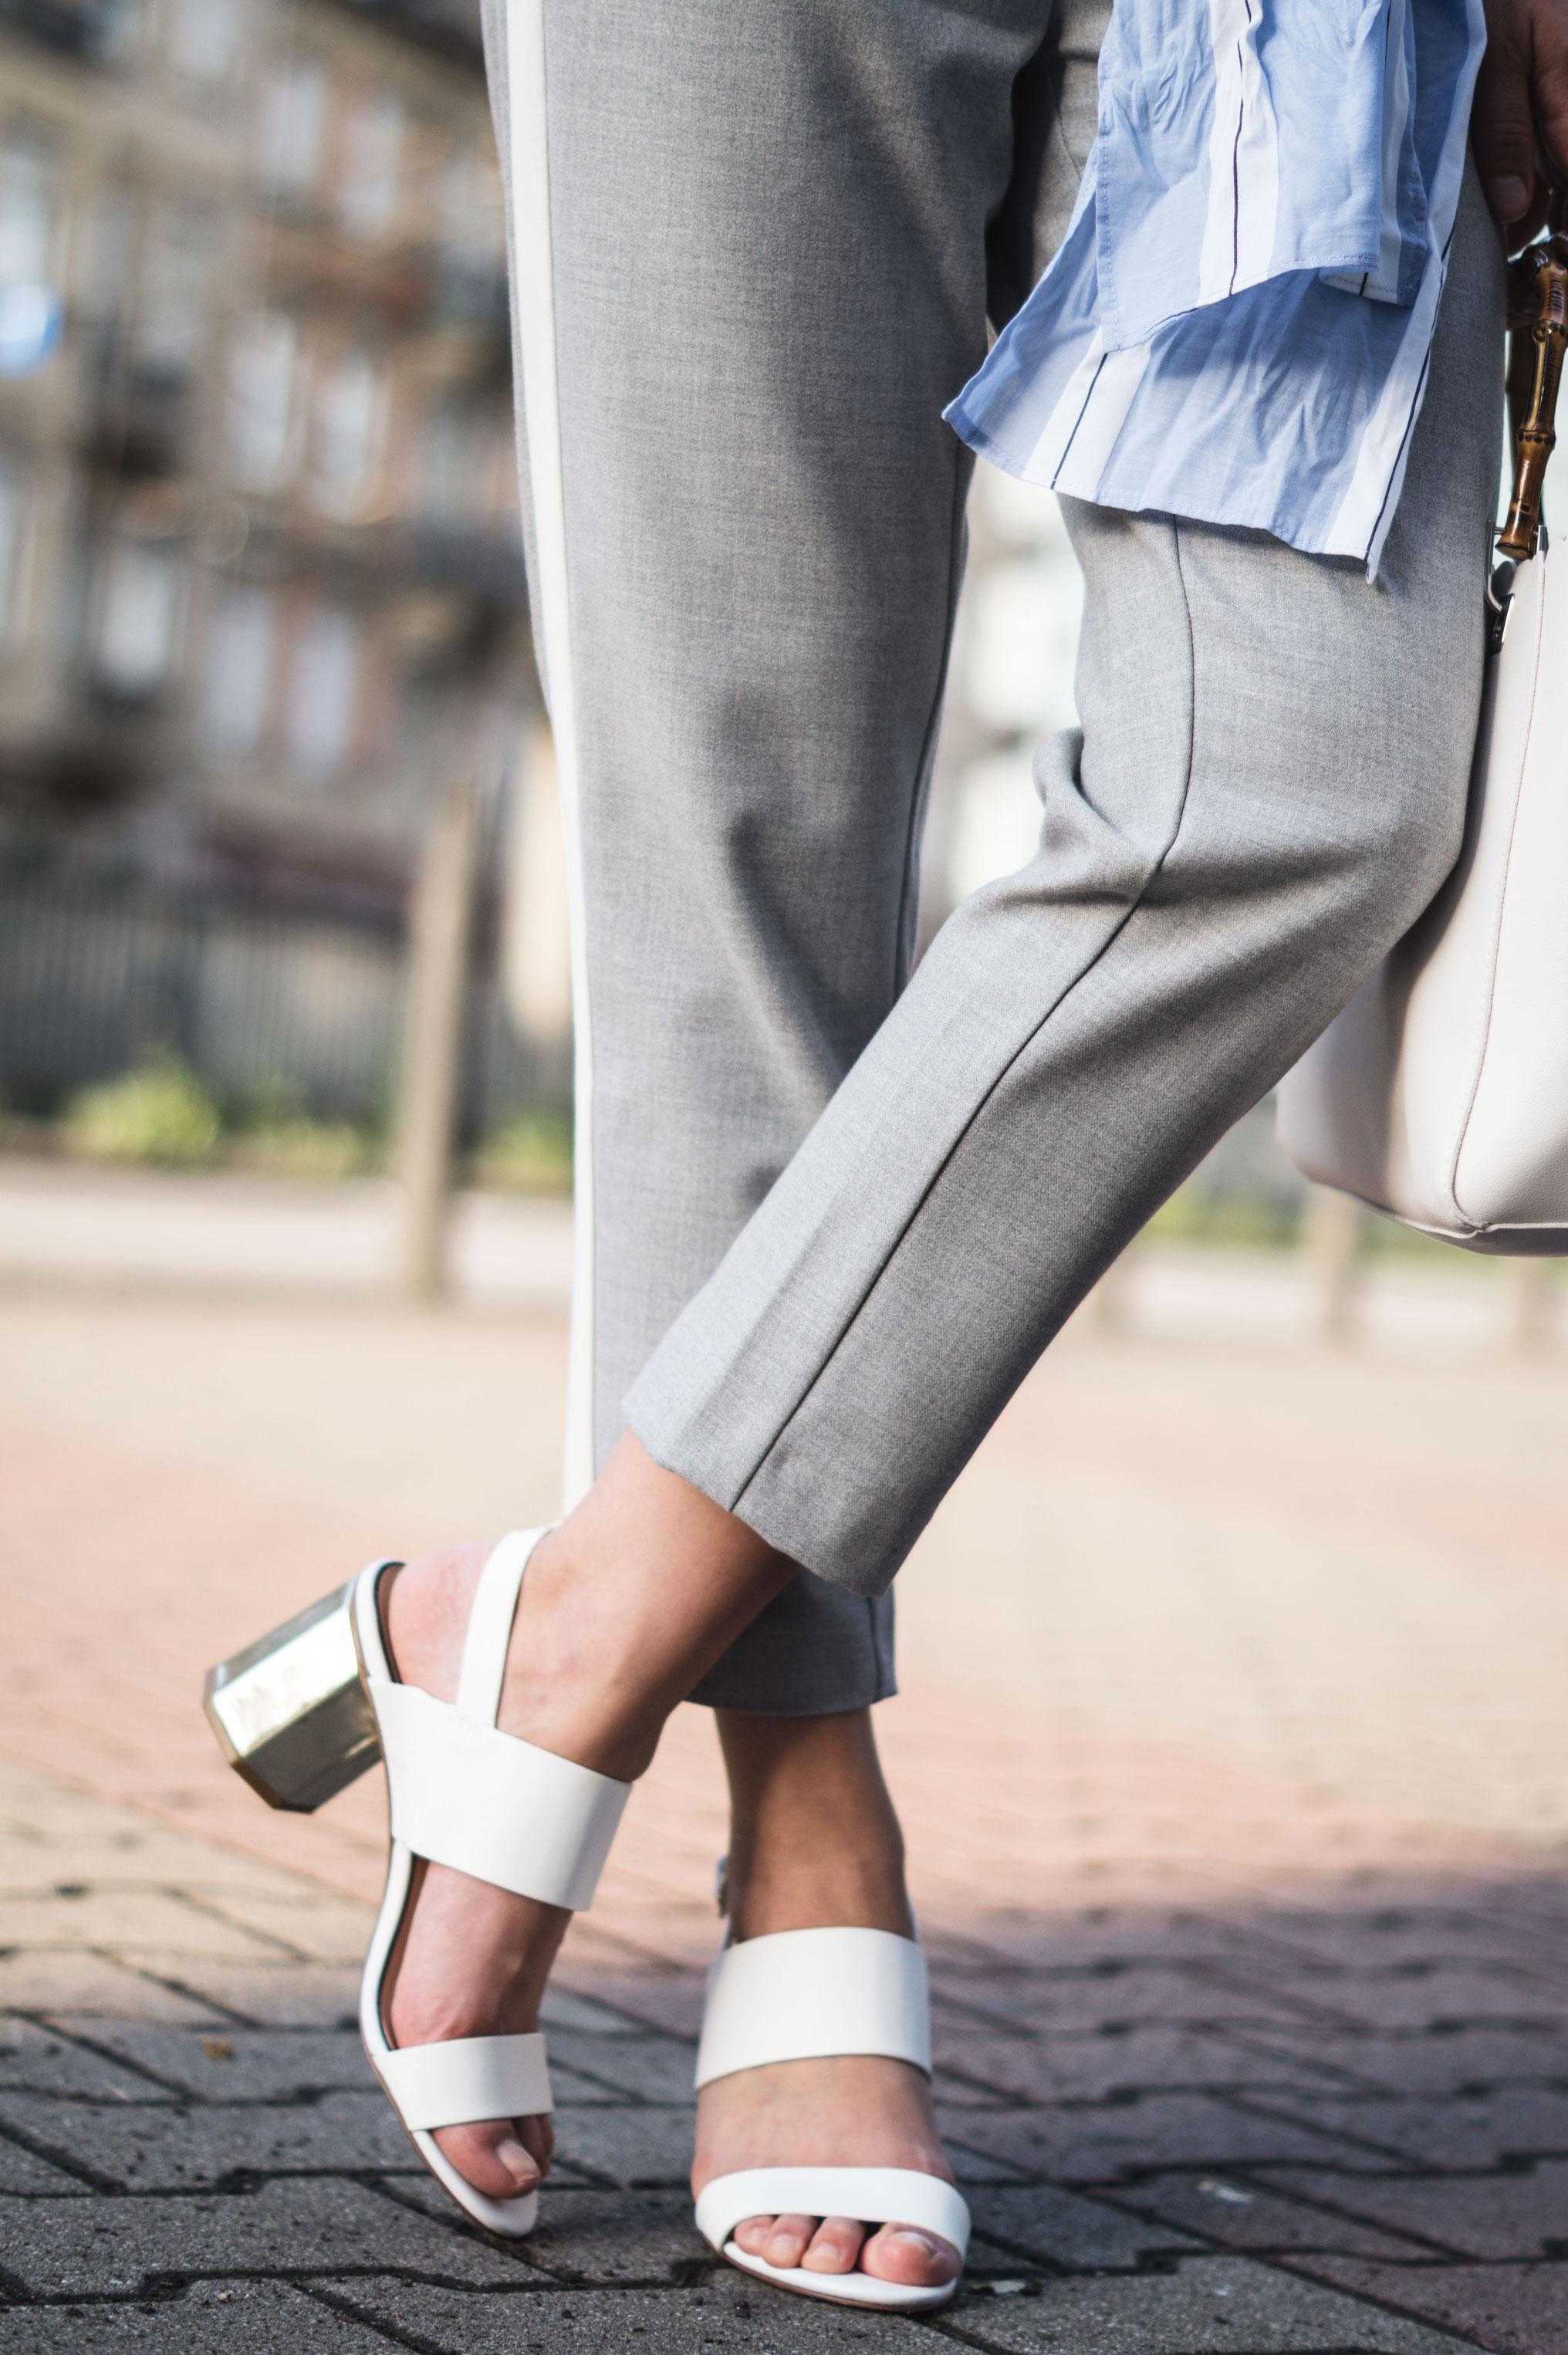 http://sariety.com/wp-content/uploads/2017/10/Mango-Wrap-Blouse-Knotenbluse-Joggers-Sariety-Fashionblogger-Modeblog-Heidelberg-Streetstyle-2.jpg